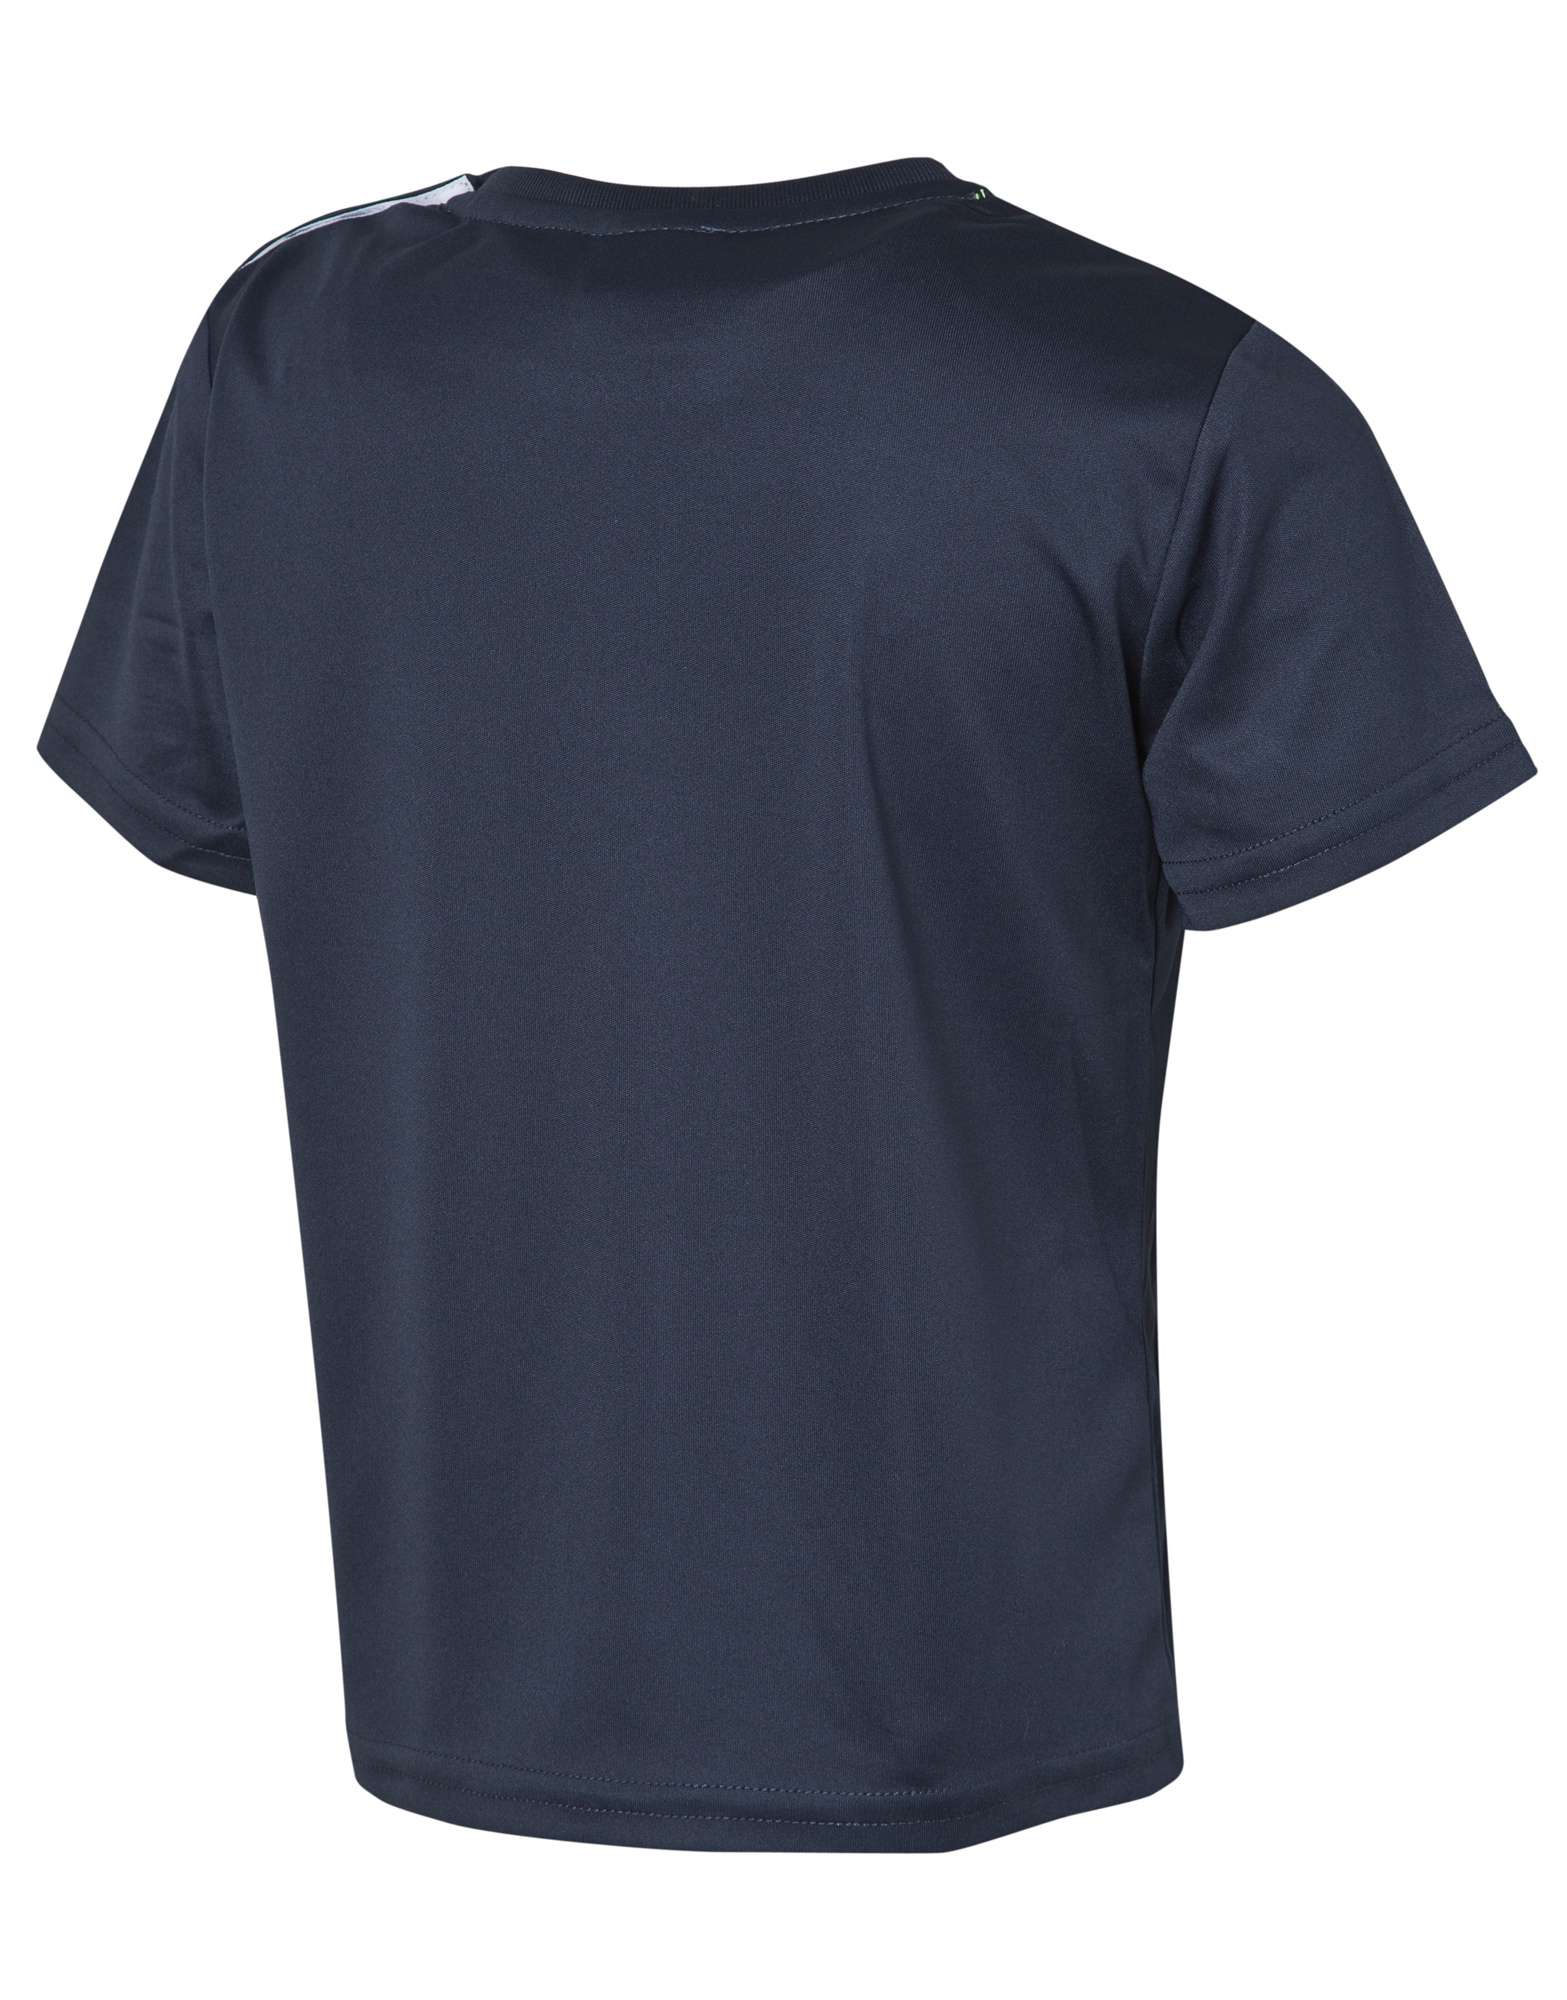 Carbrini Nelson Poly T-Shirt Infants